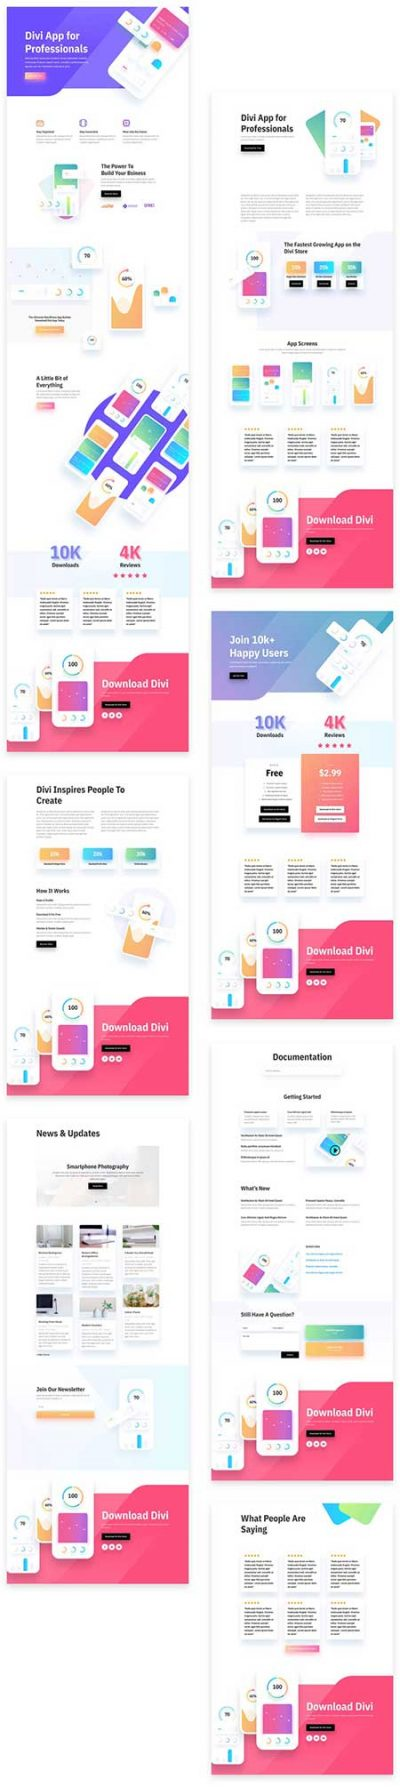 Divi mobile app layout pack